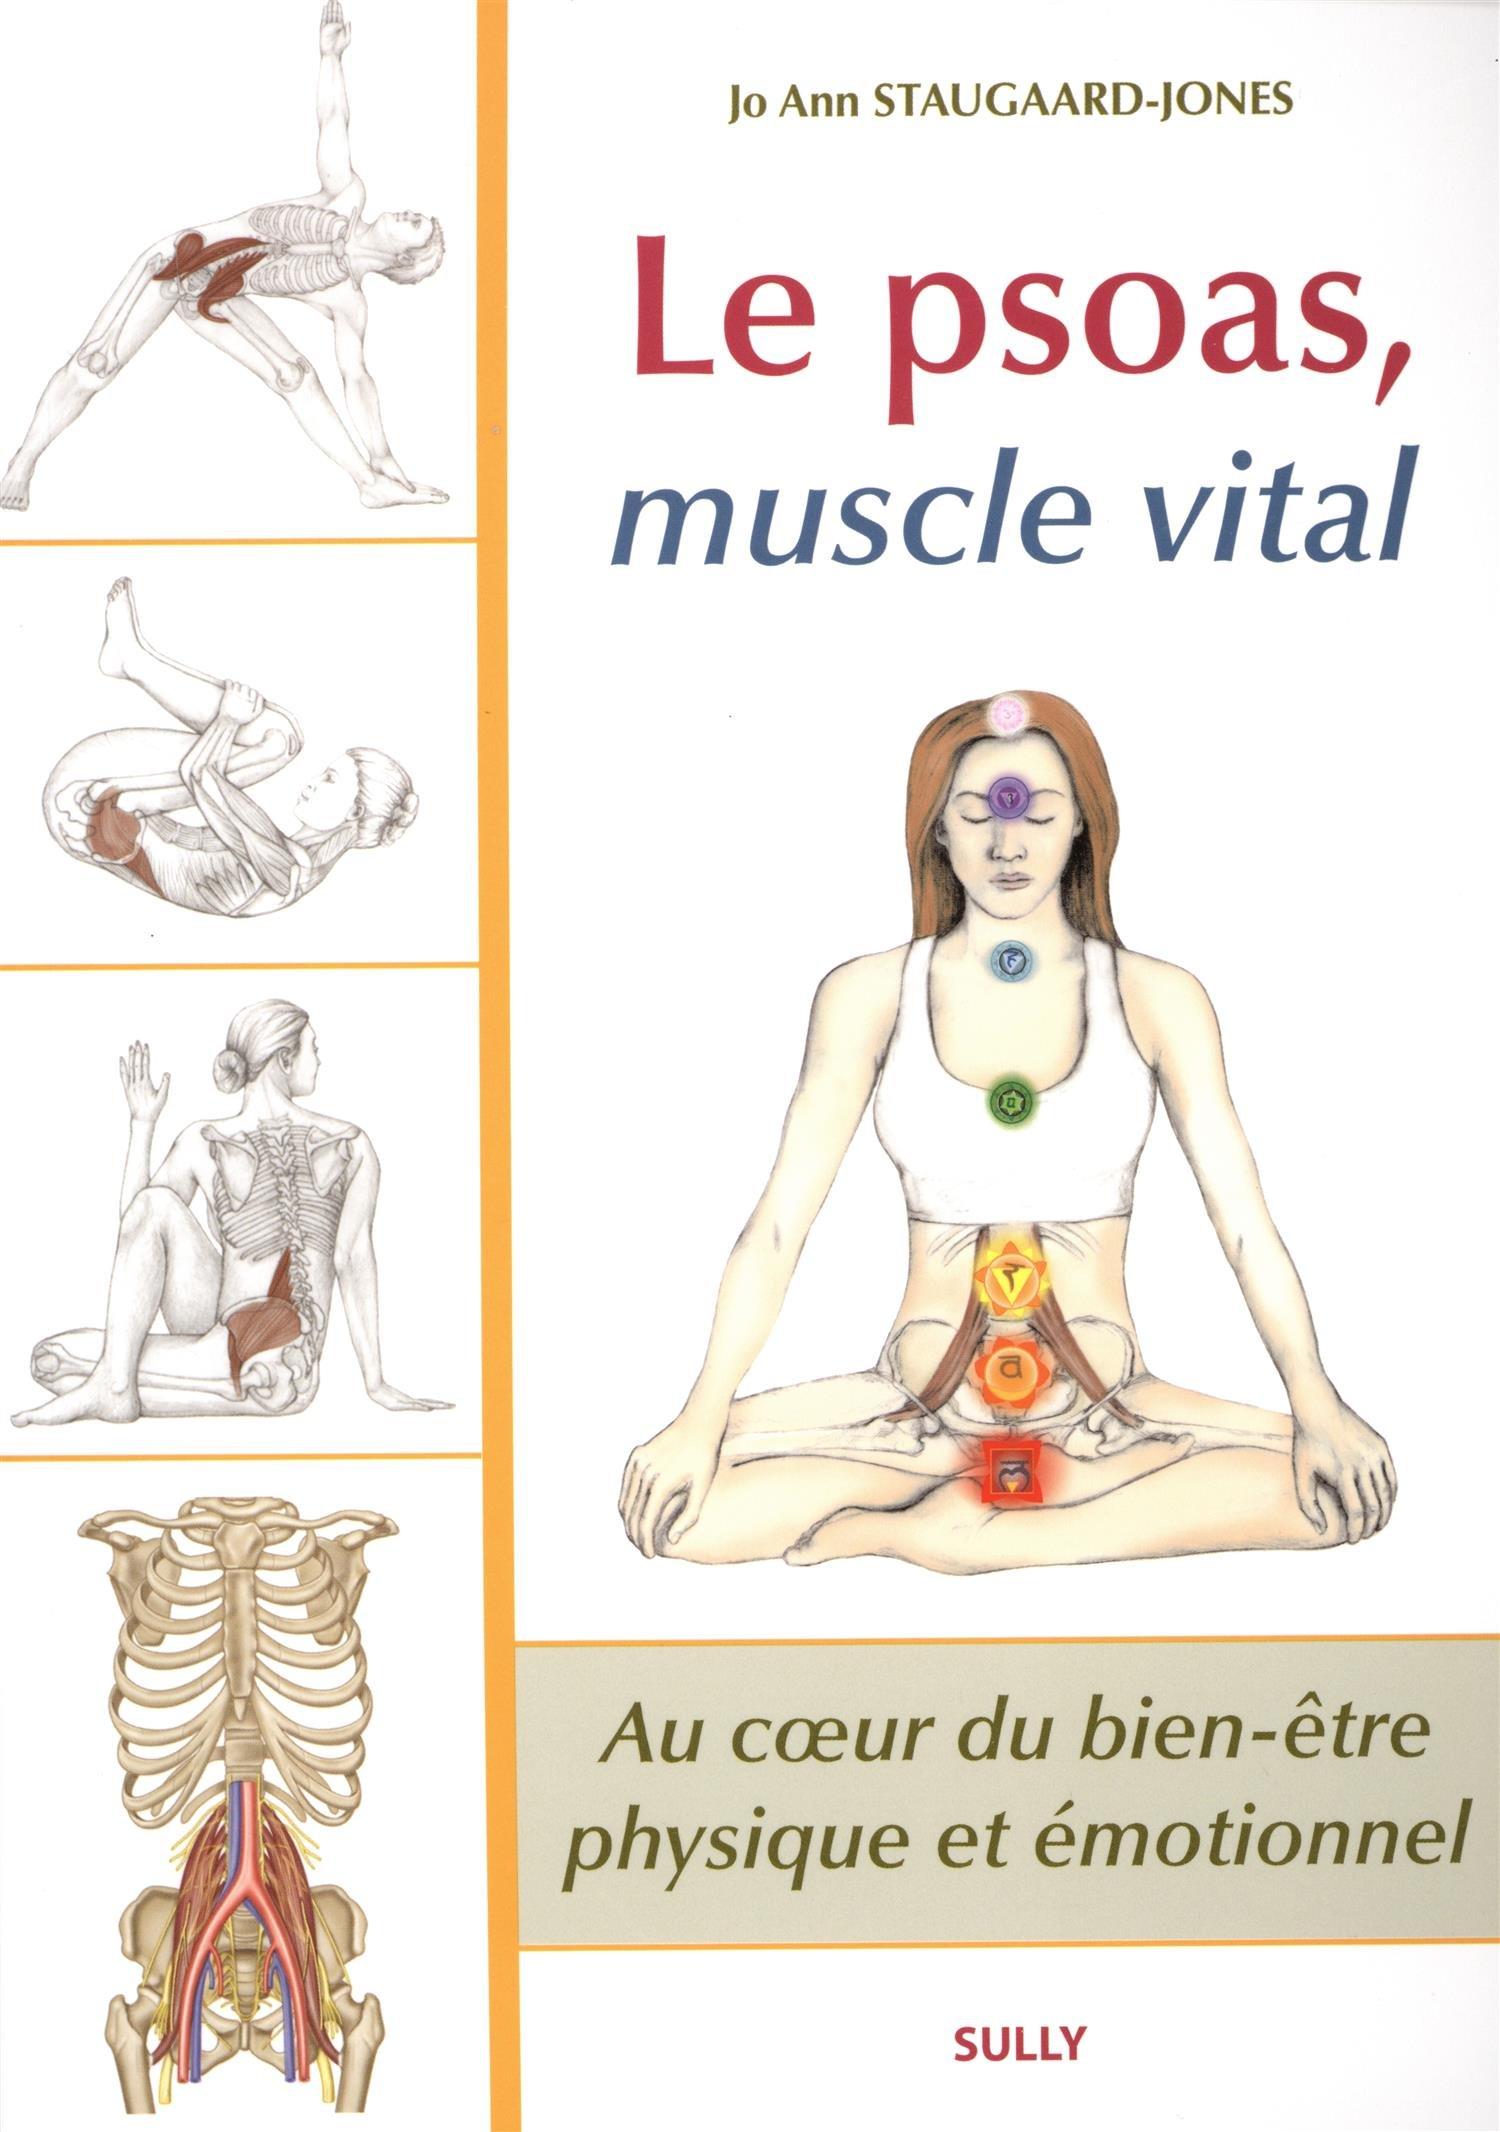 Le psoas, muscle vital: Amazon.de: Jo Ann Staugaard-Jones ...